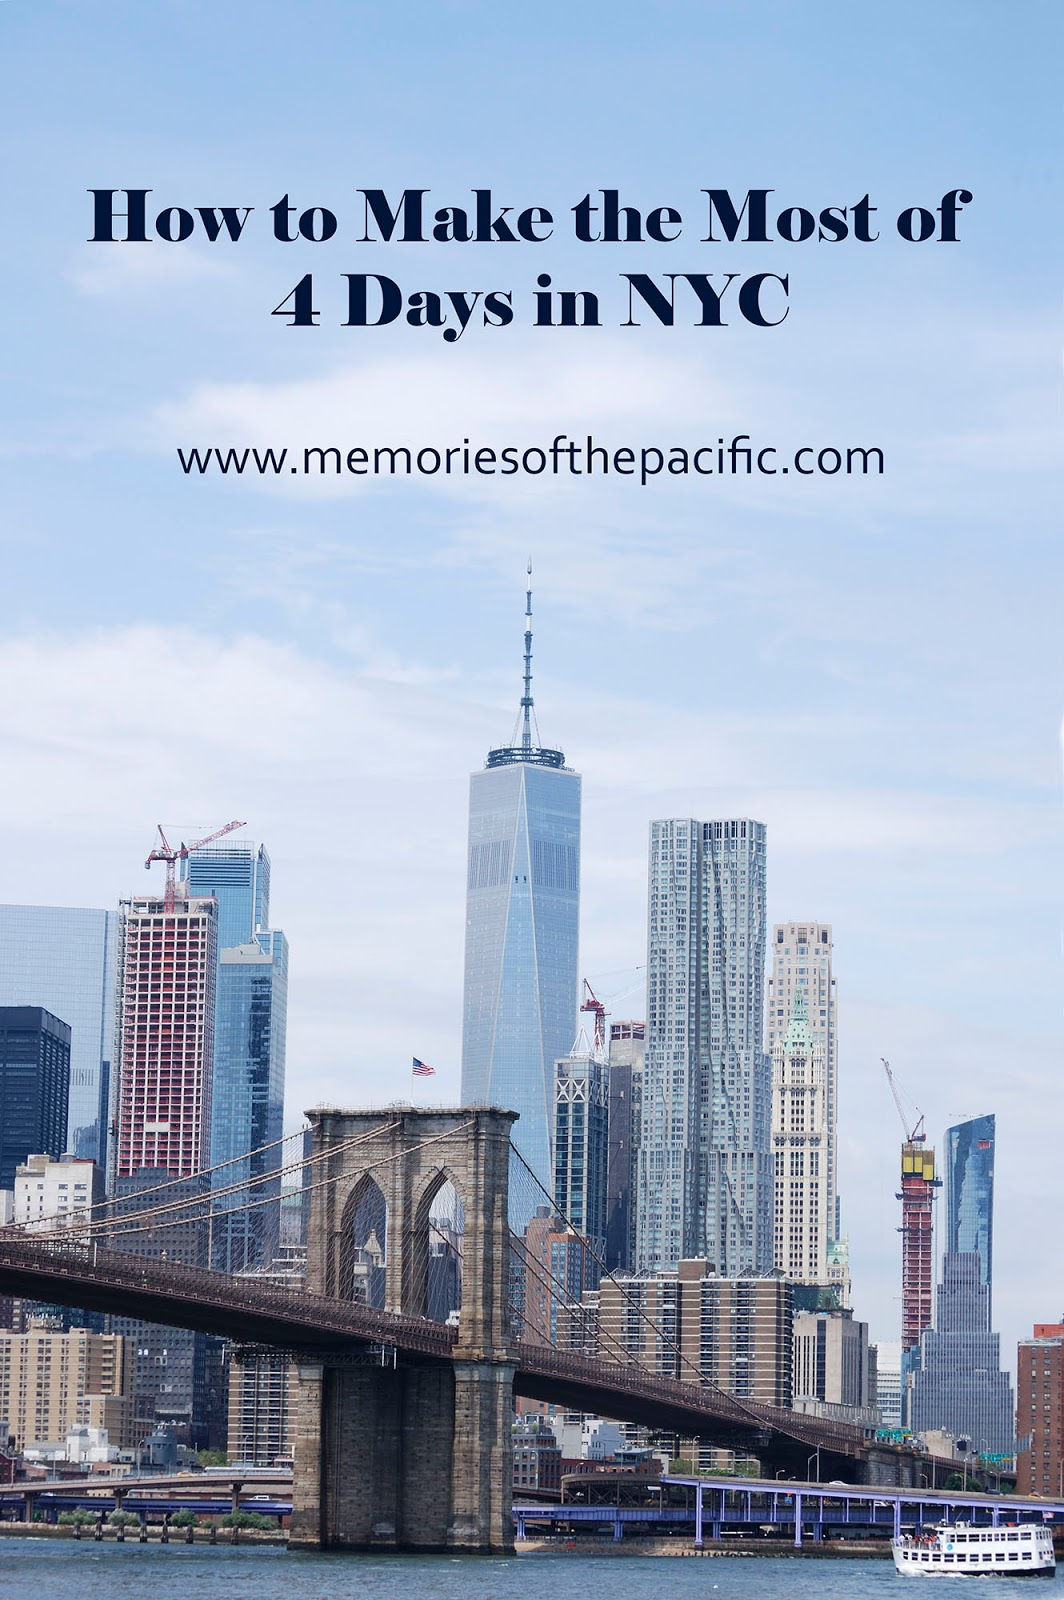 new york itinerary guide plan brooklyn bridge dumbo manhattan